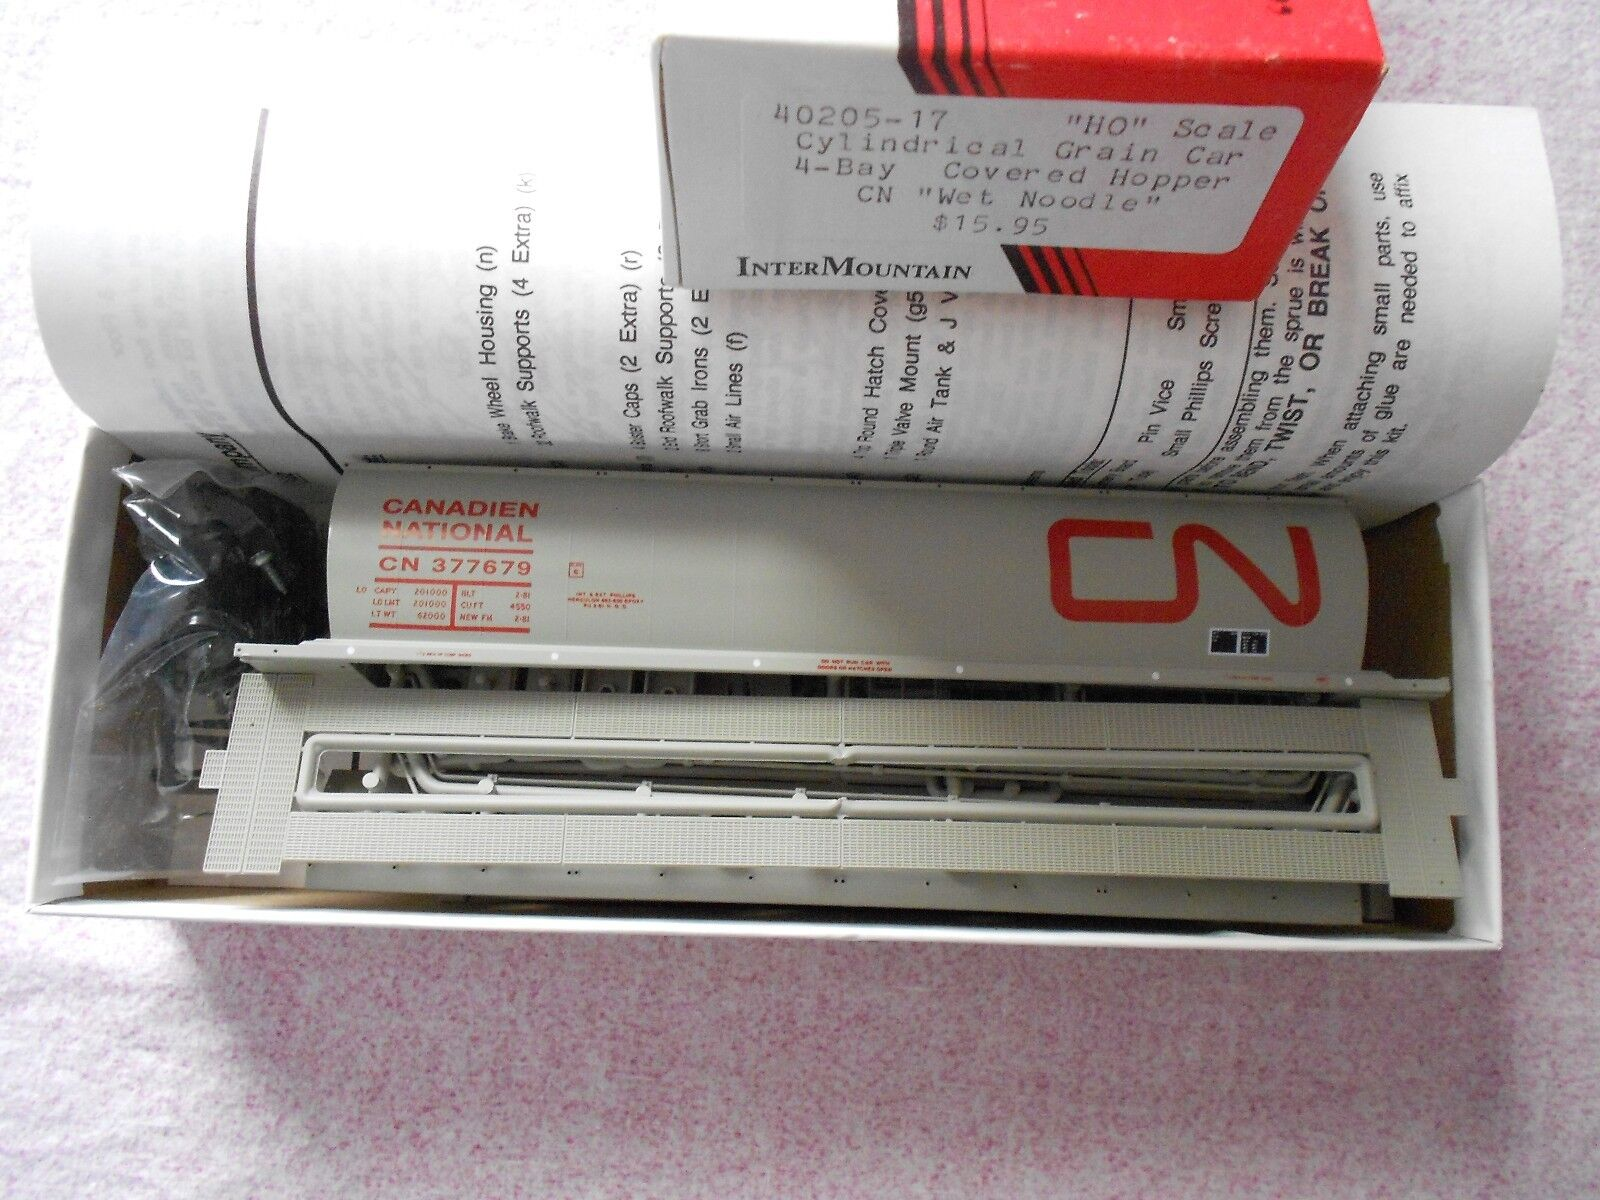 INTERMOUNTAIN CYLINDRICAL GRAIN CAR 4 BAY COVERED HOPPER HO CANADIAN NATIONAL NI